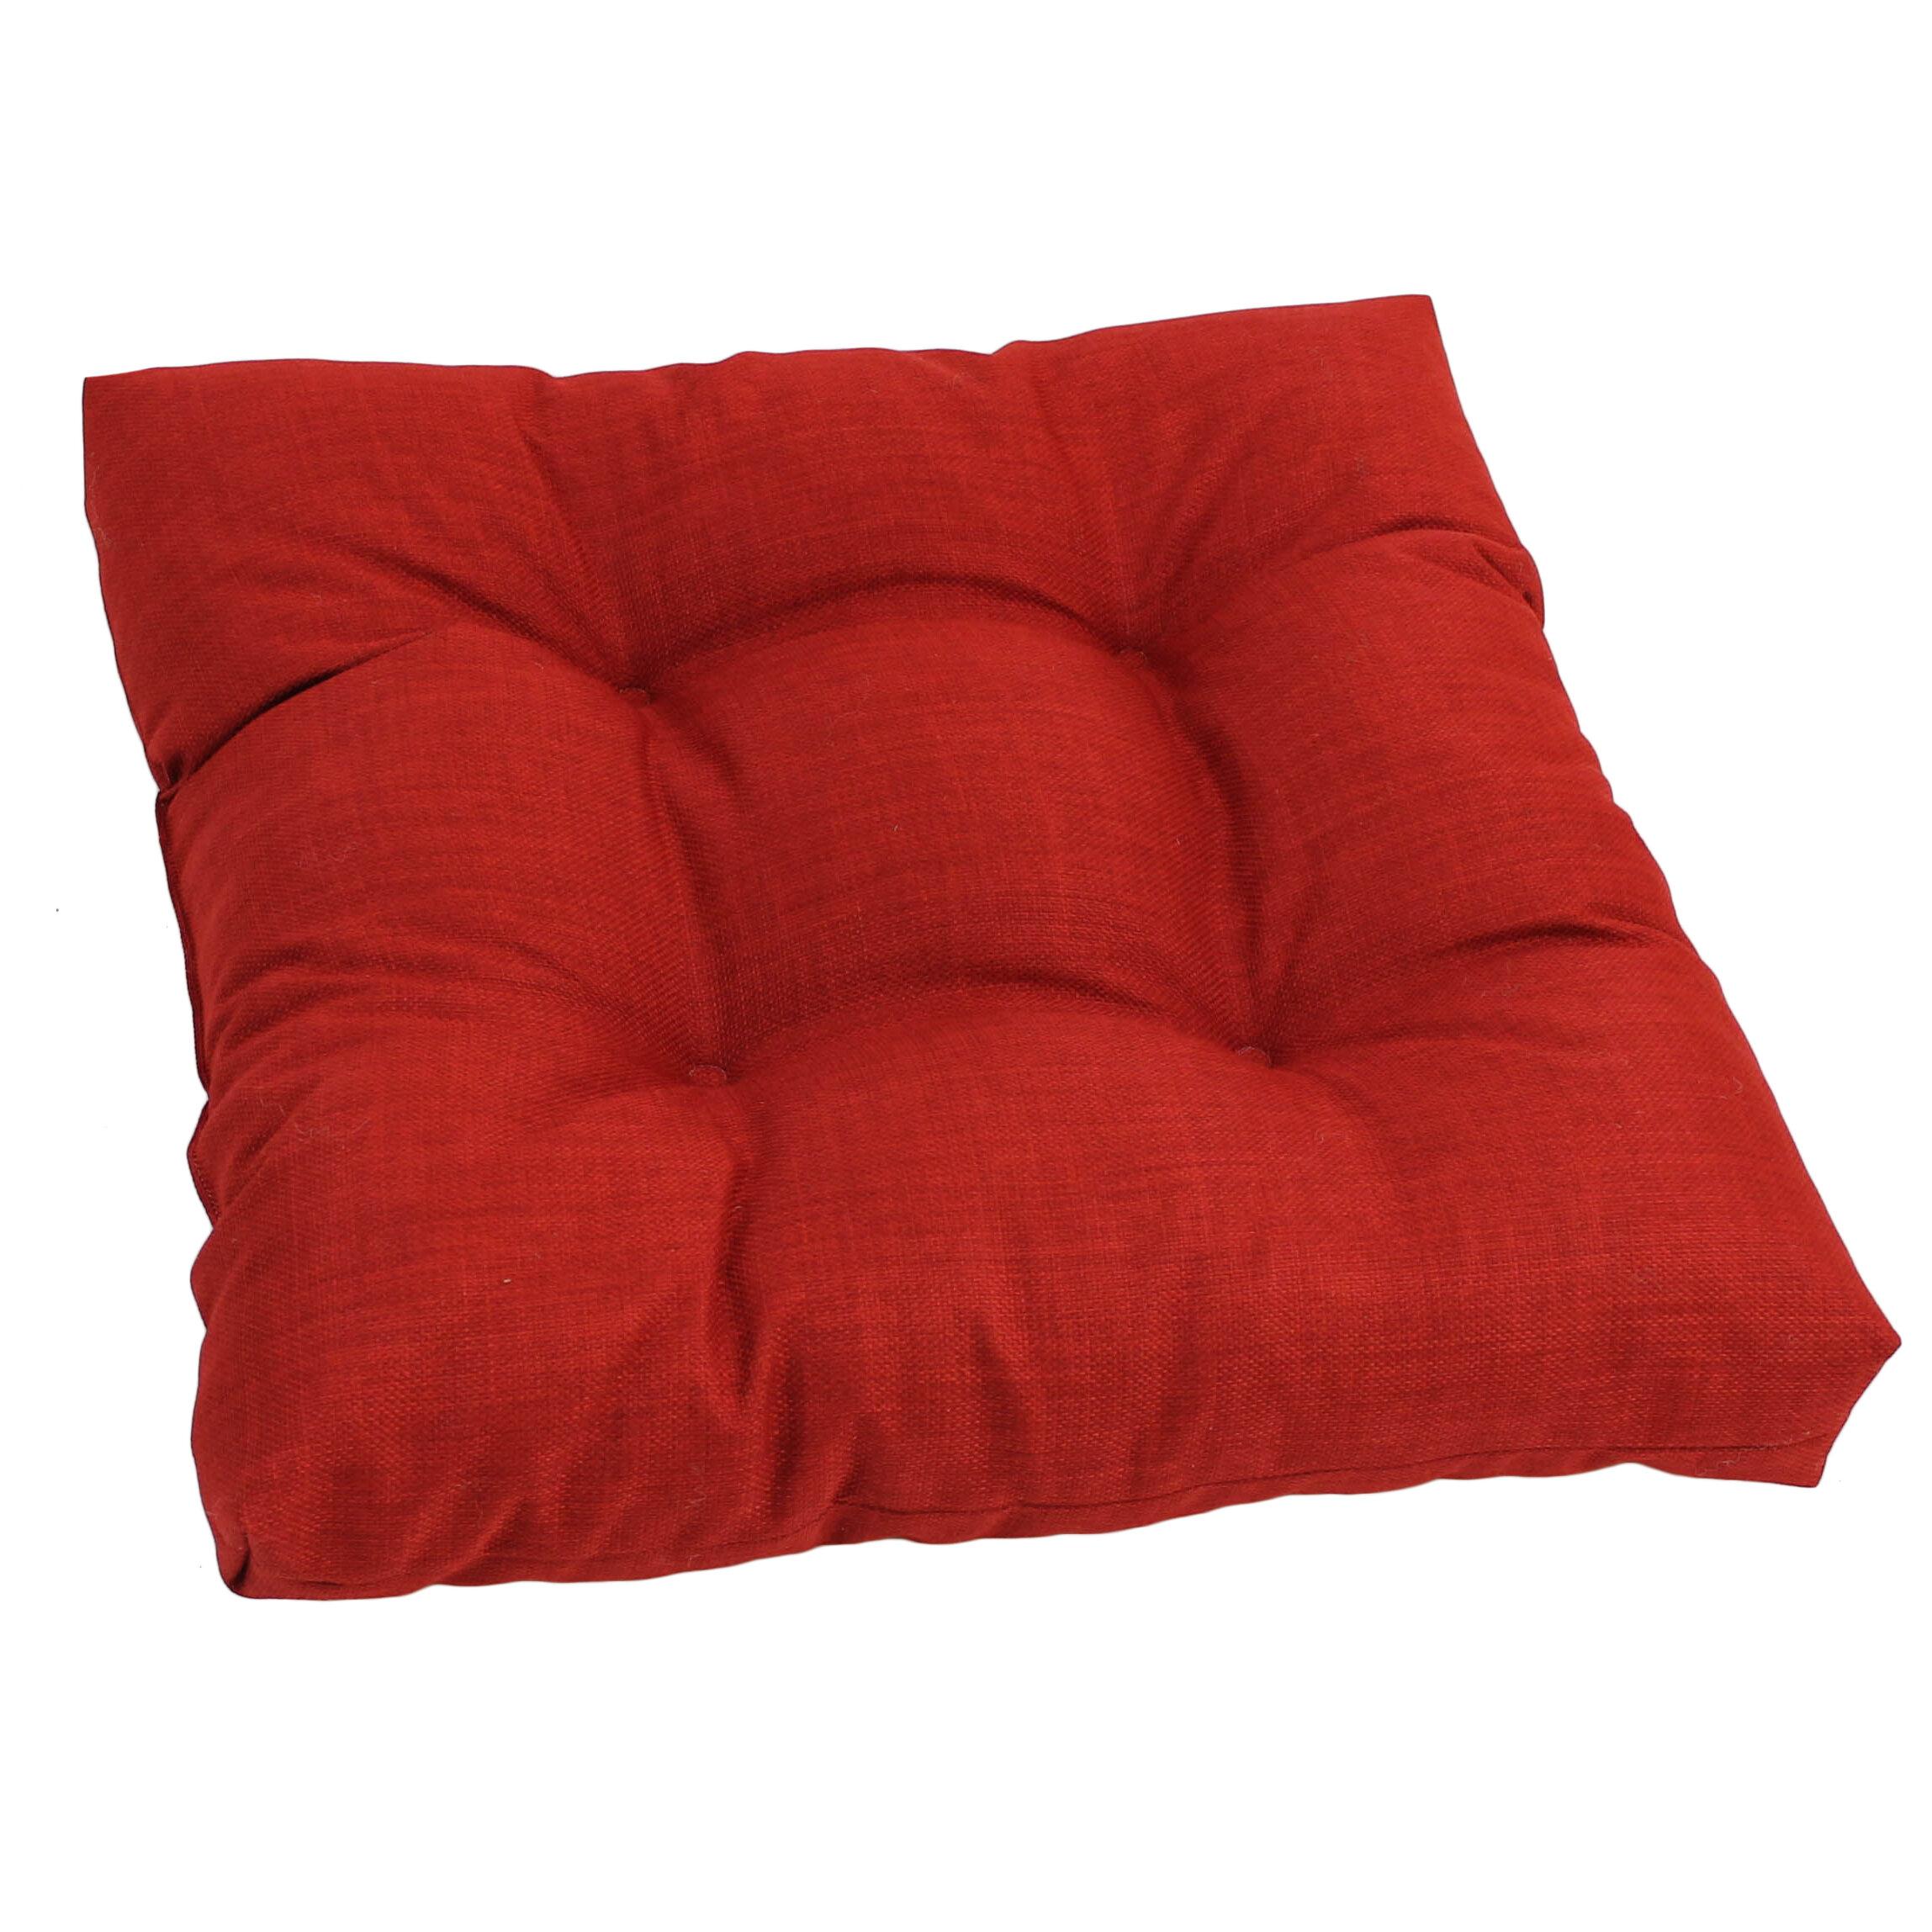 Indoor Outdoor Patio Chair Rocker Cushion